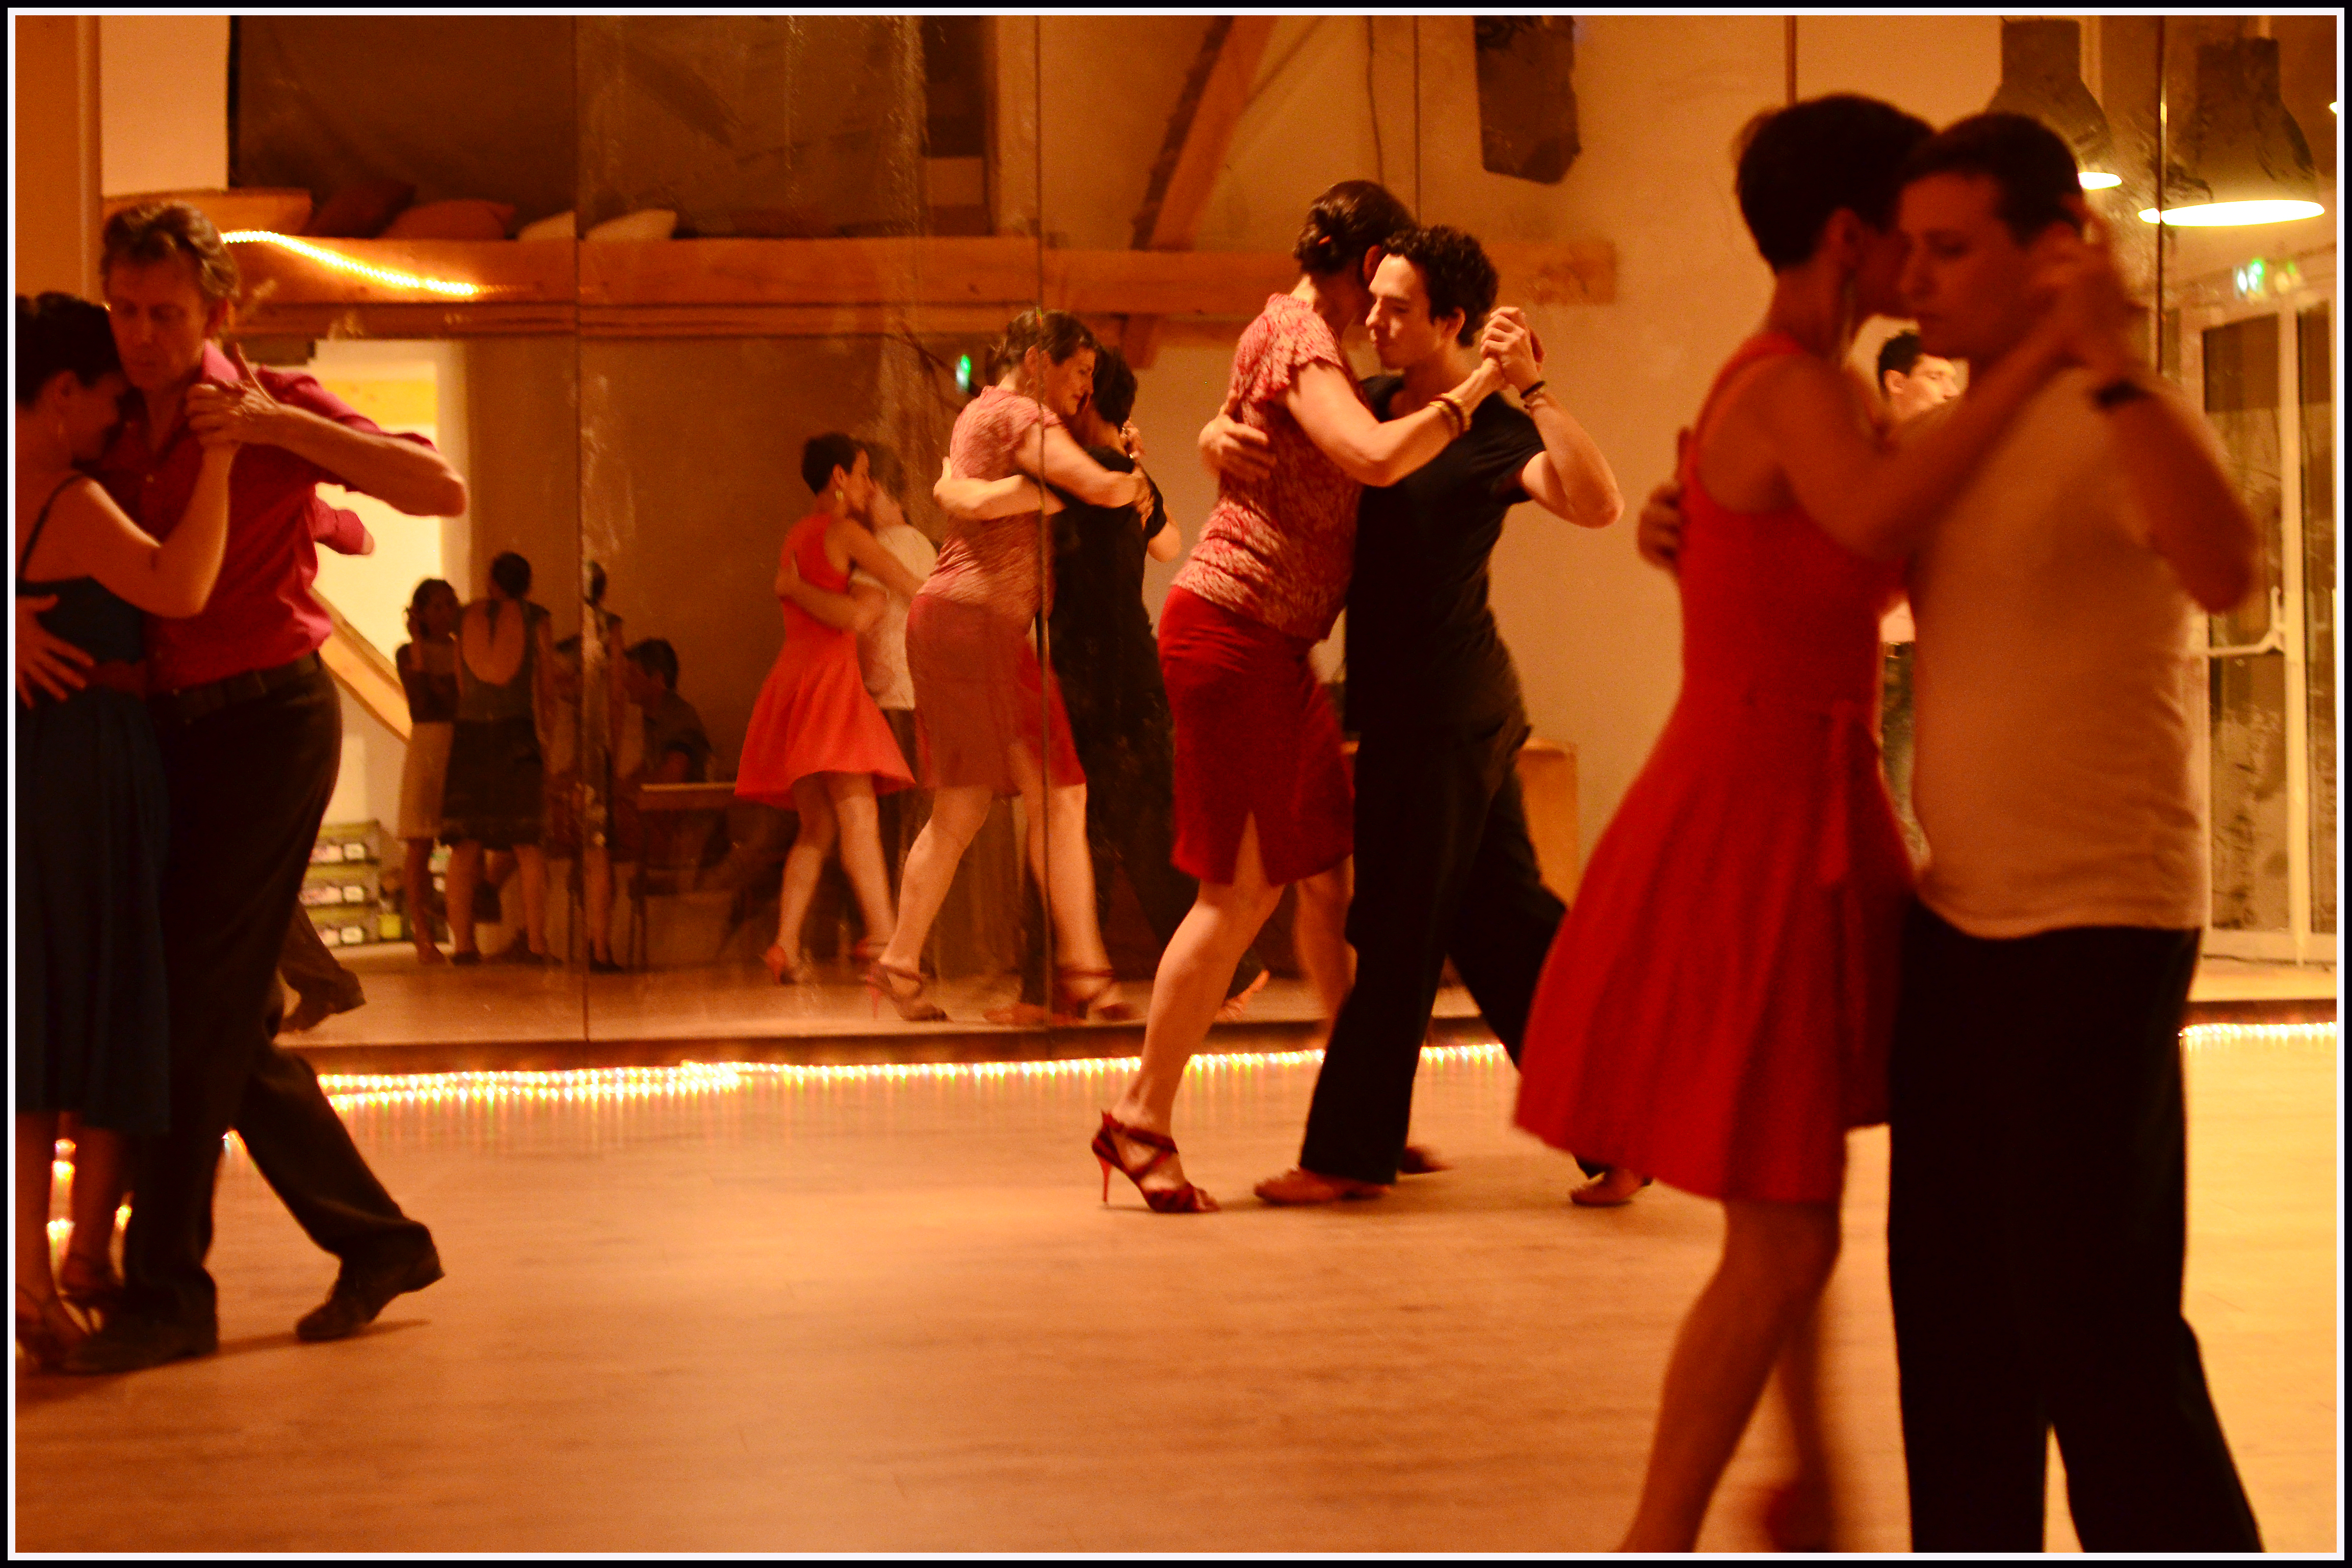 Tango argentin milonga soirée